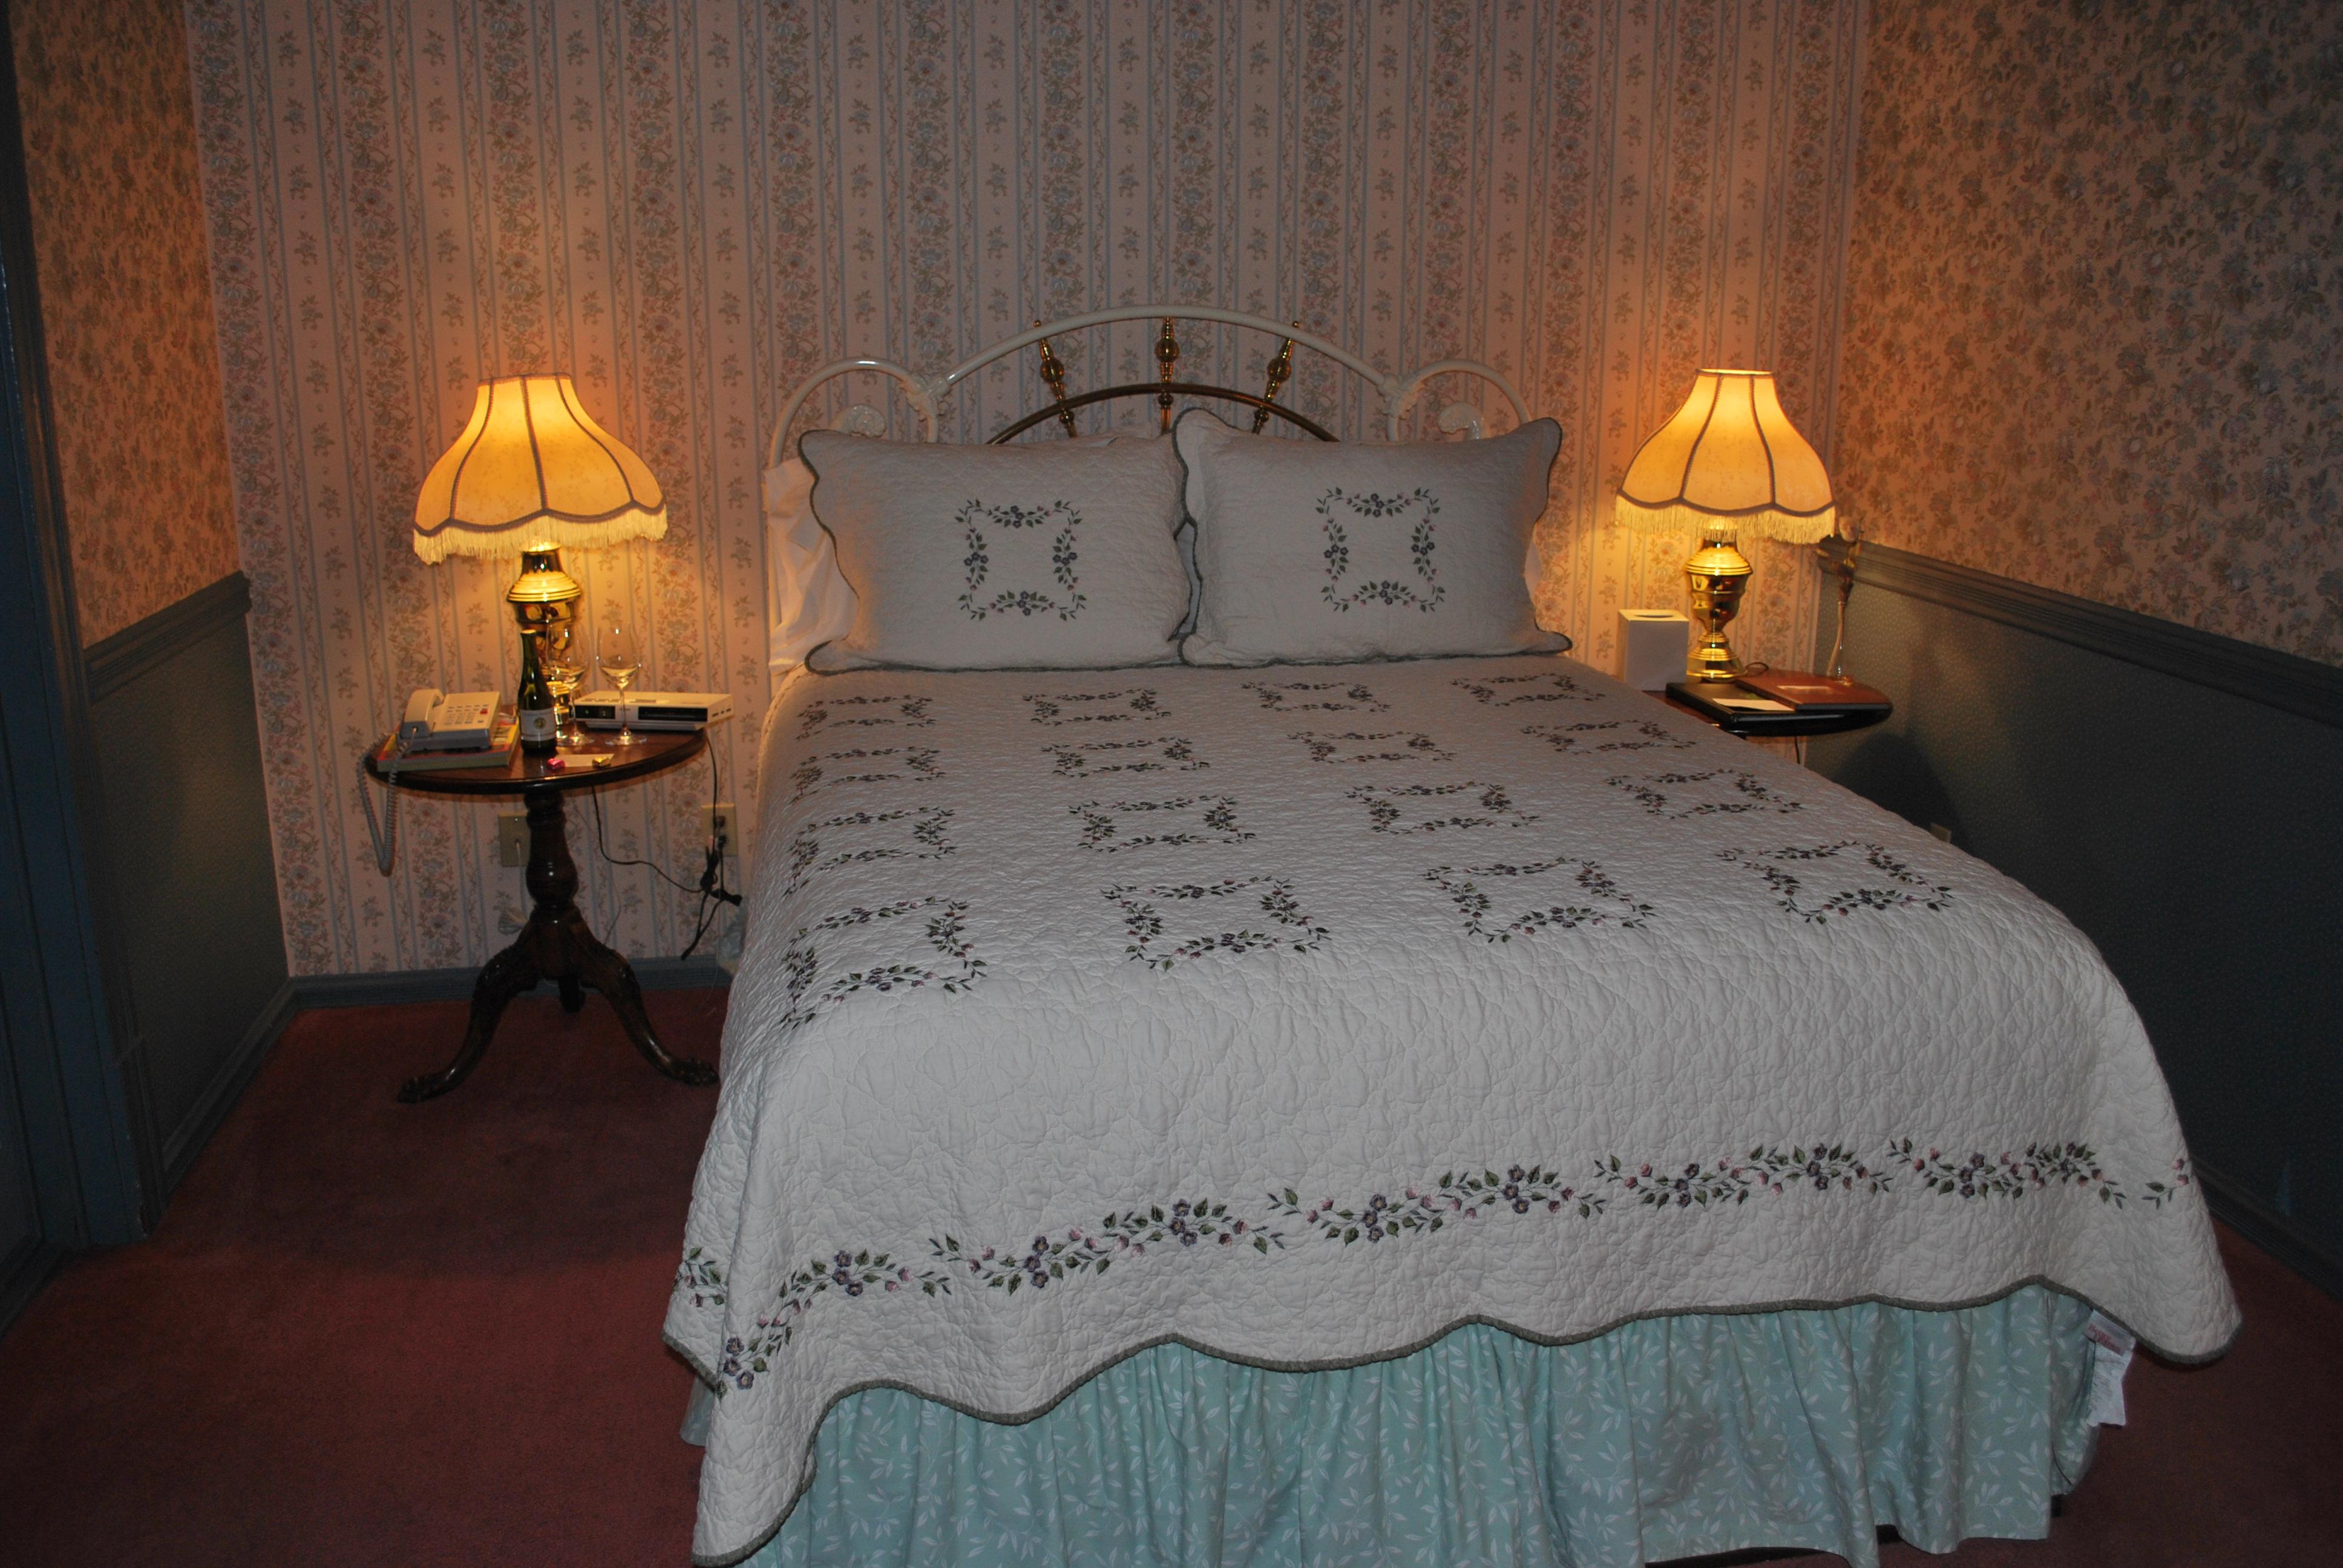 Our totally cute Victorian era room at the Hopland Inn.